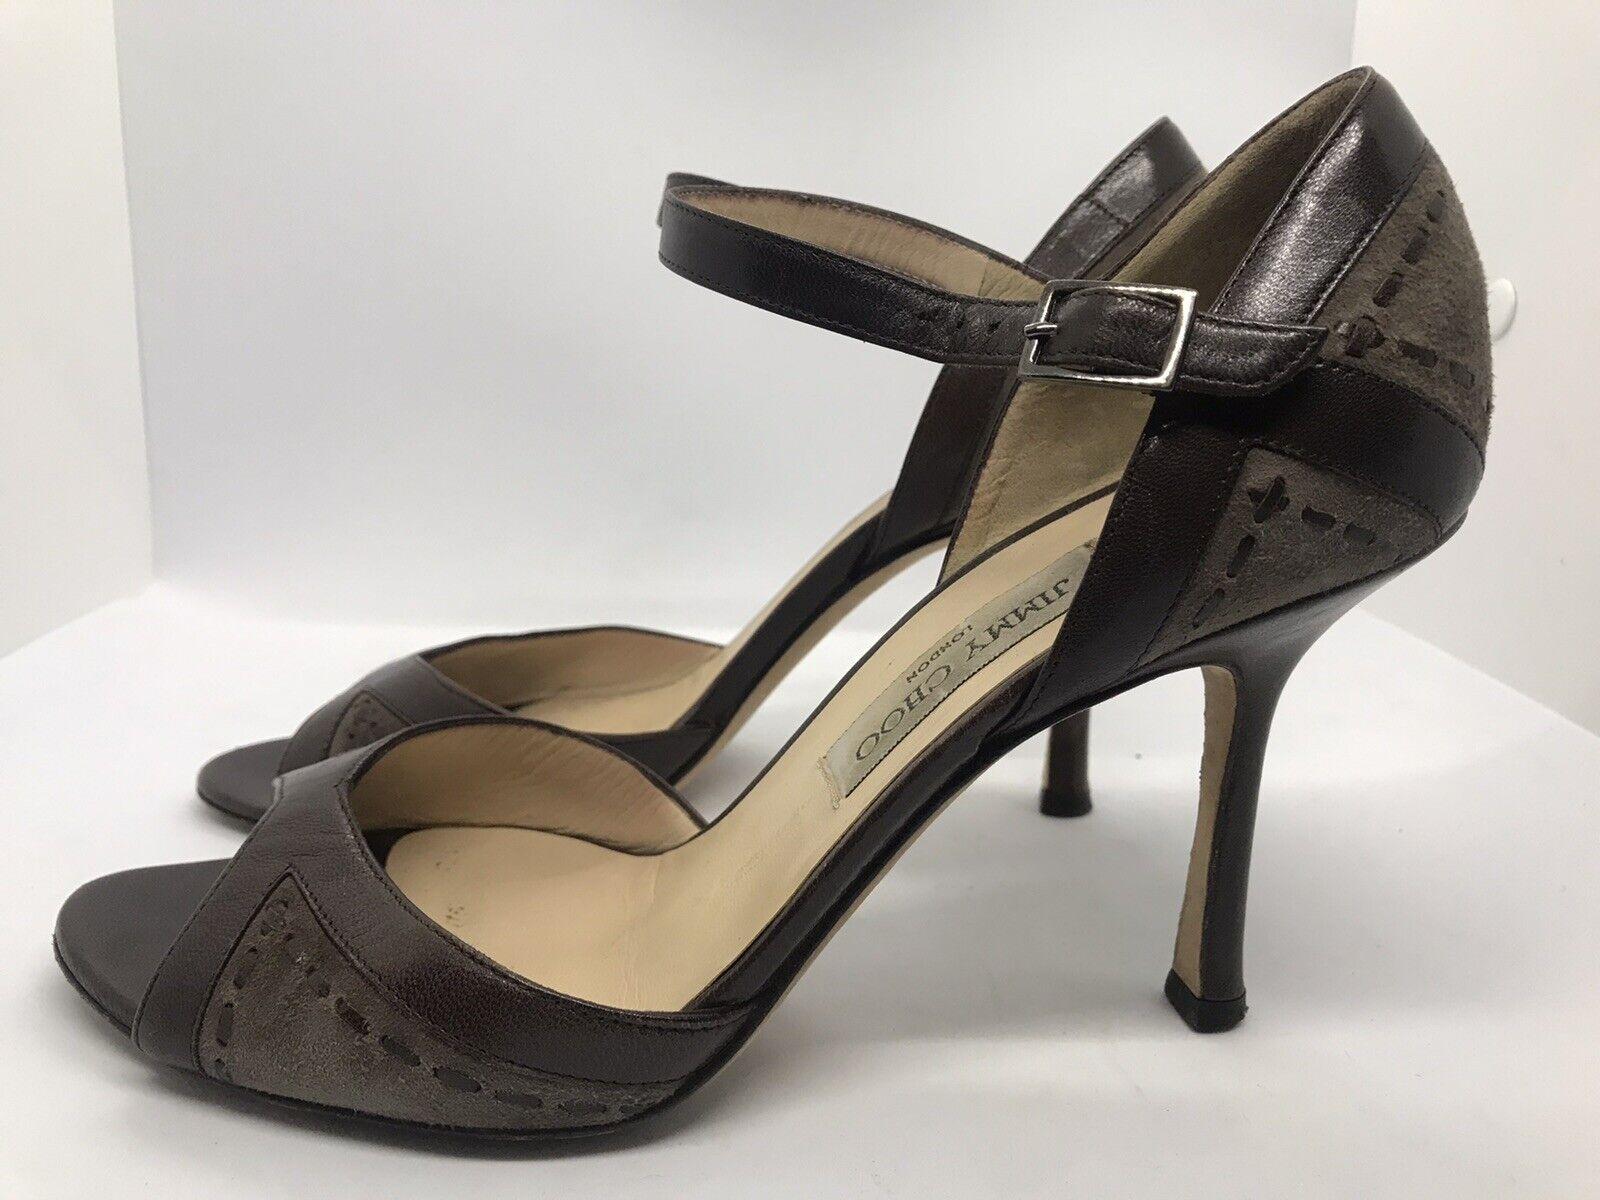 RARE EUC Jimmy Choo 39 US 9 braun Suede Leather damen HeelsPumps Ankle Strap C1